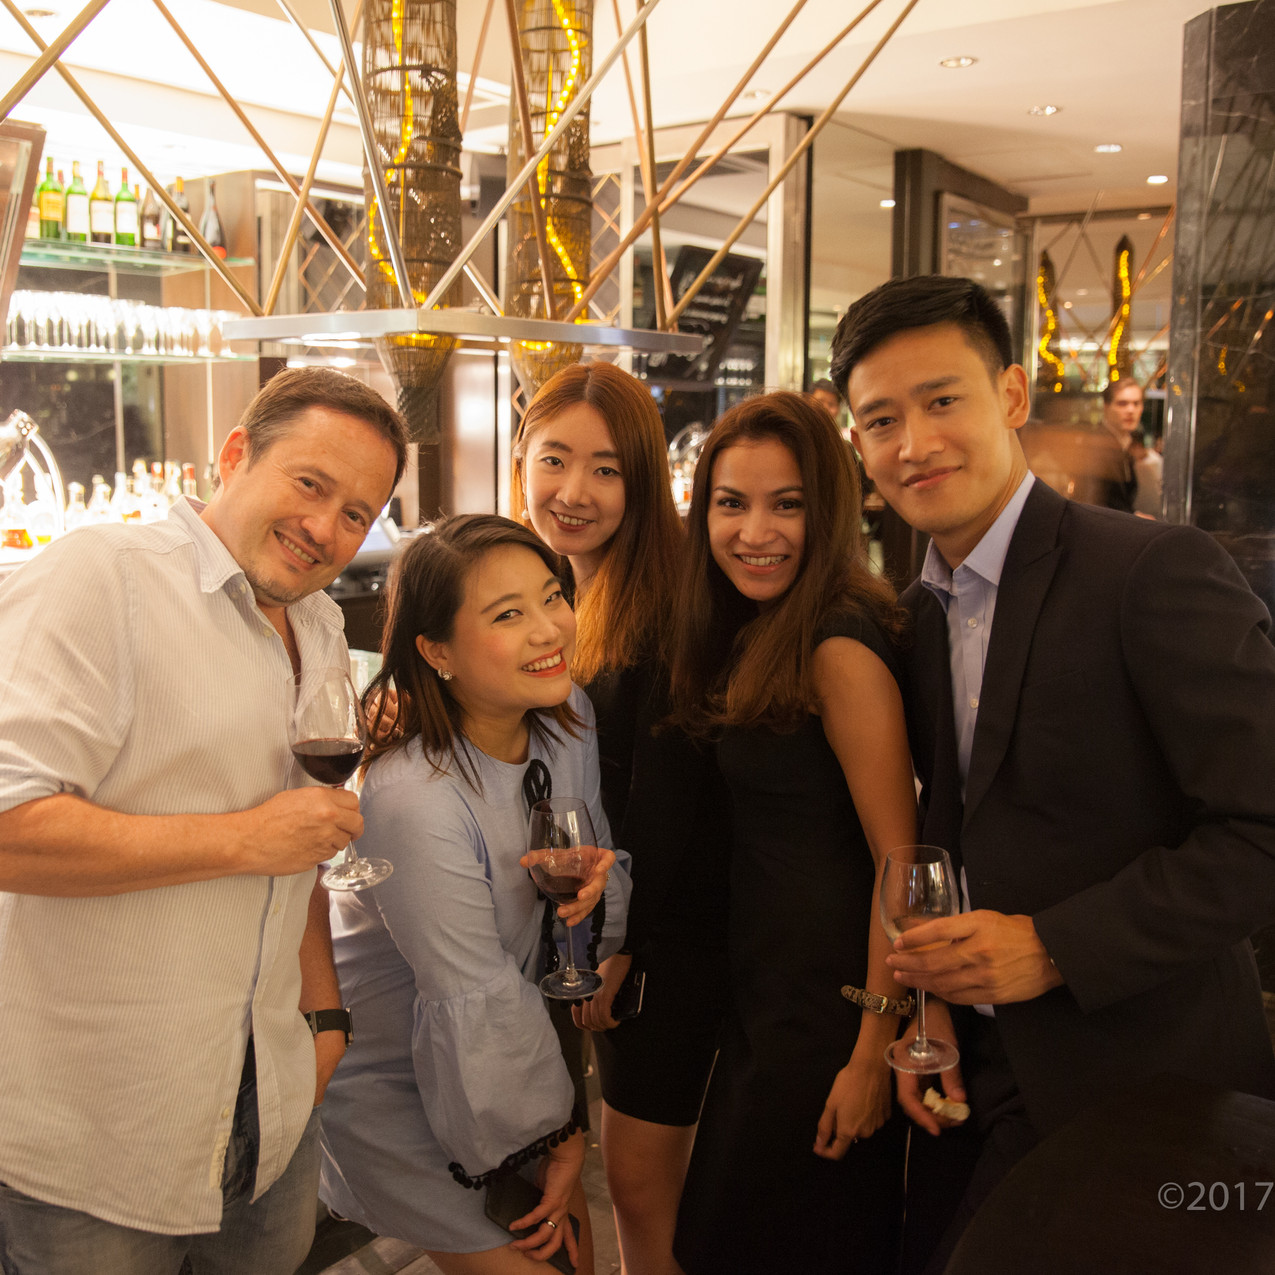 494 Wine Tasting | thaifoodies.co